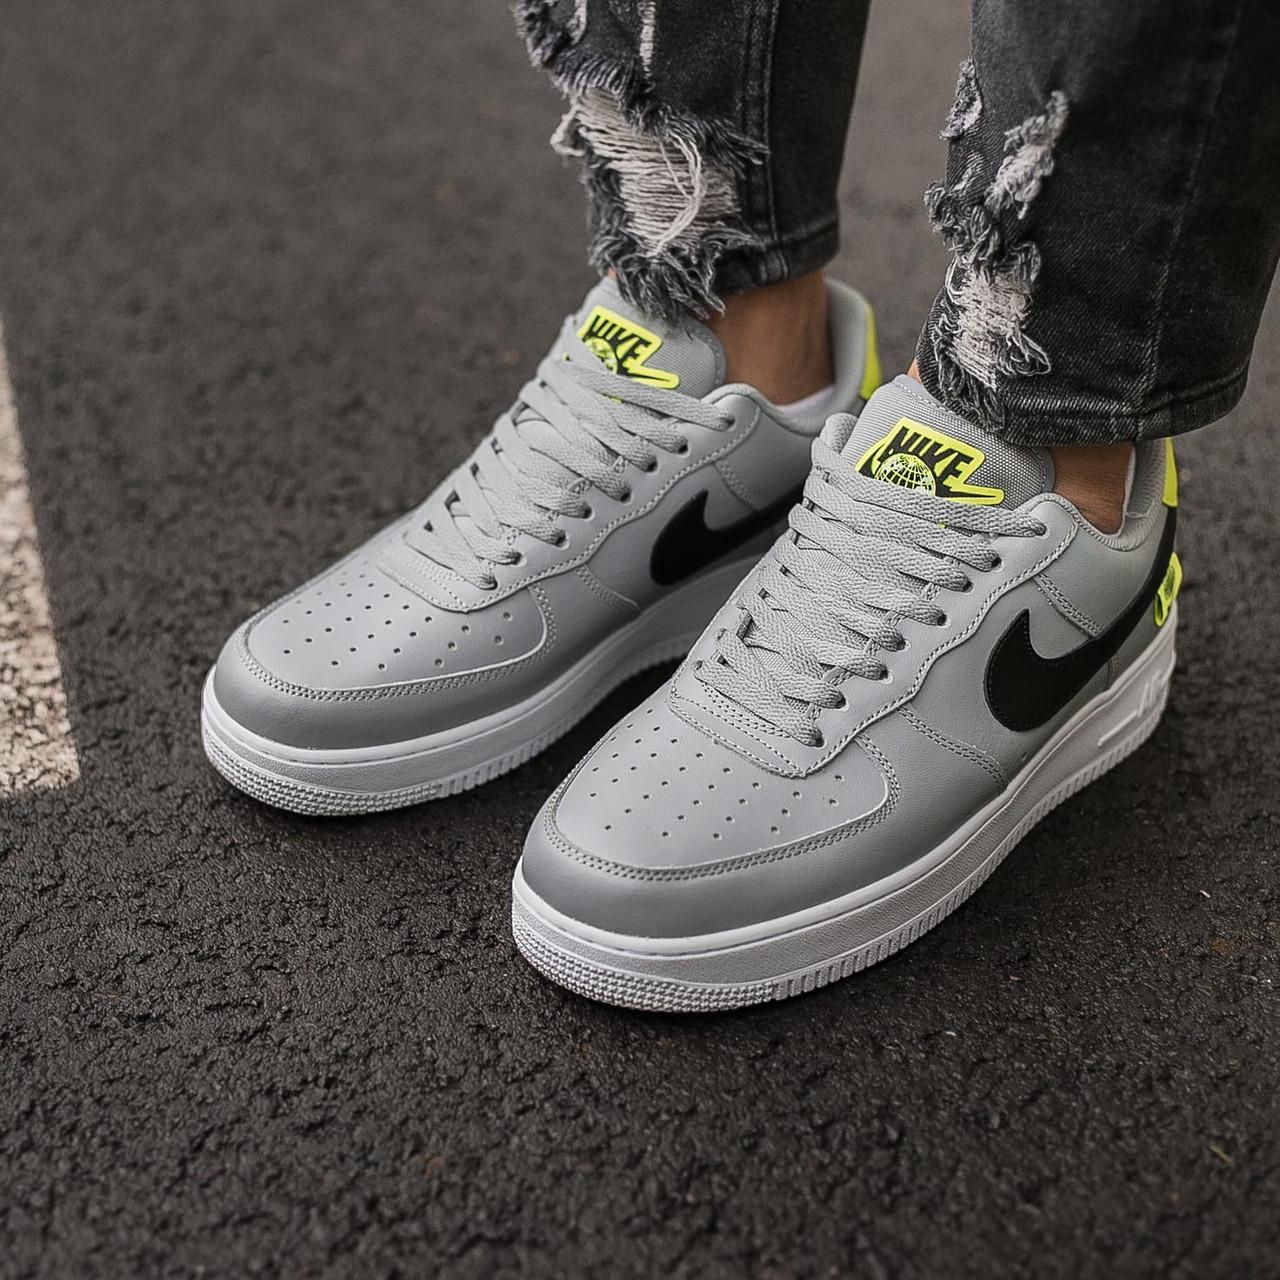 Кроссовки мужские Nike Air Force 1 World, серые